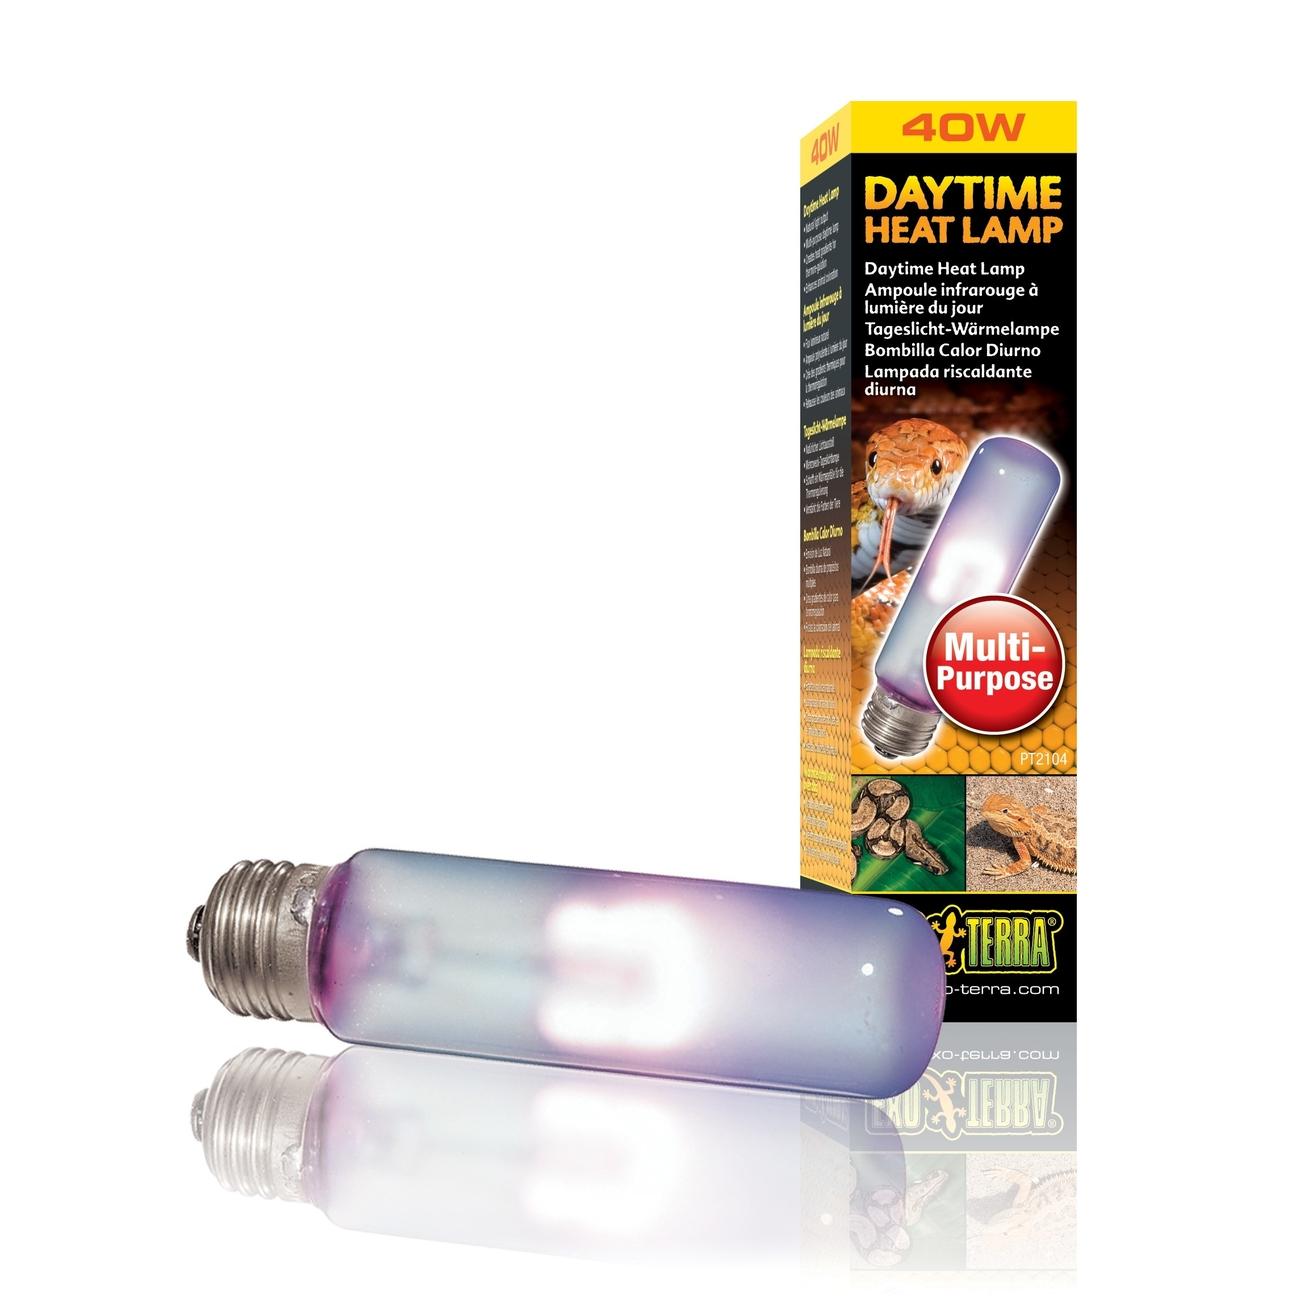 Exo Terra - Daytime Heat Lampe, Bild 5